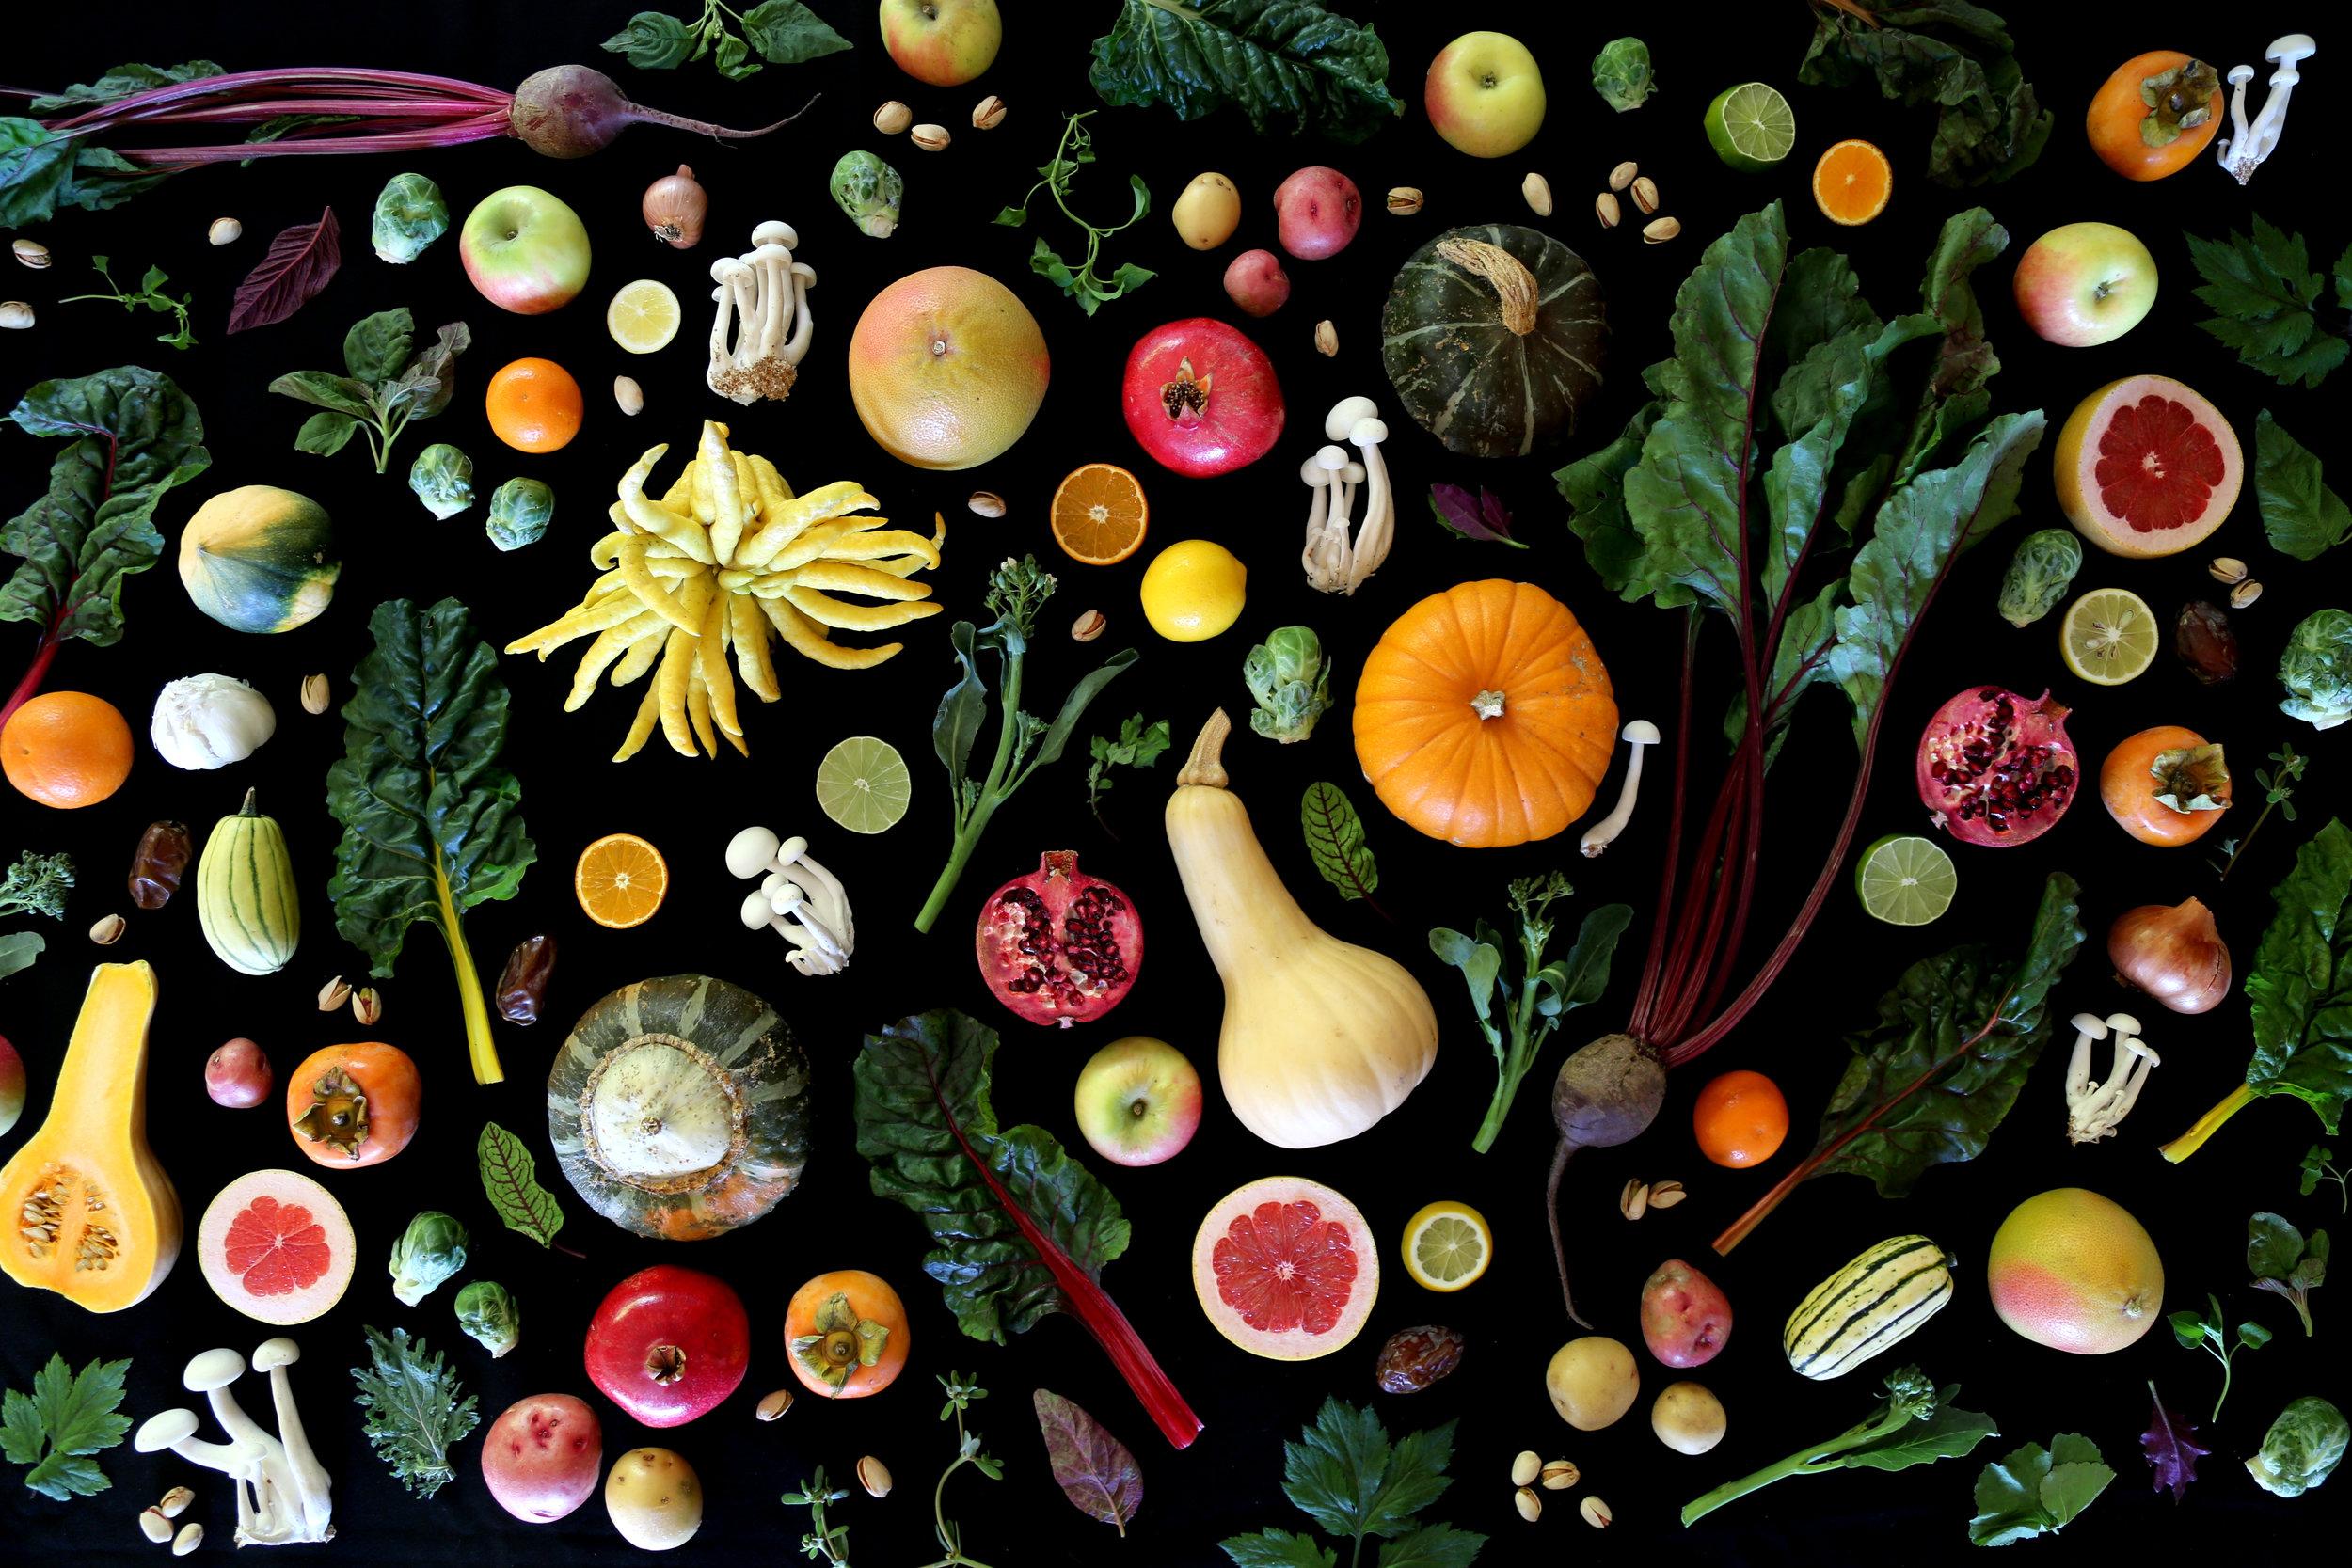 The-San-Luis-Obispo-Farmers-Market-Cookbook-Kickstarter